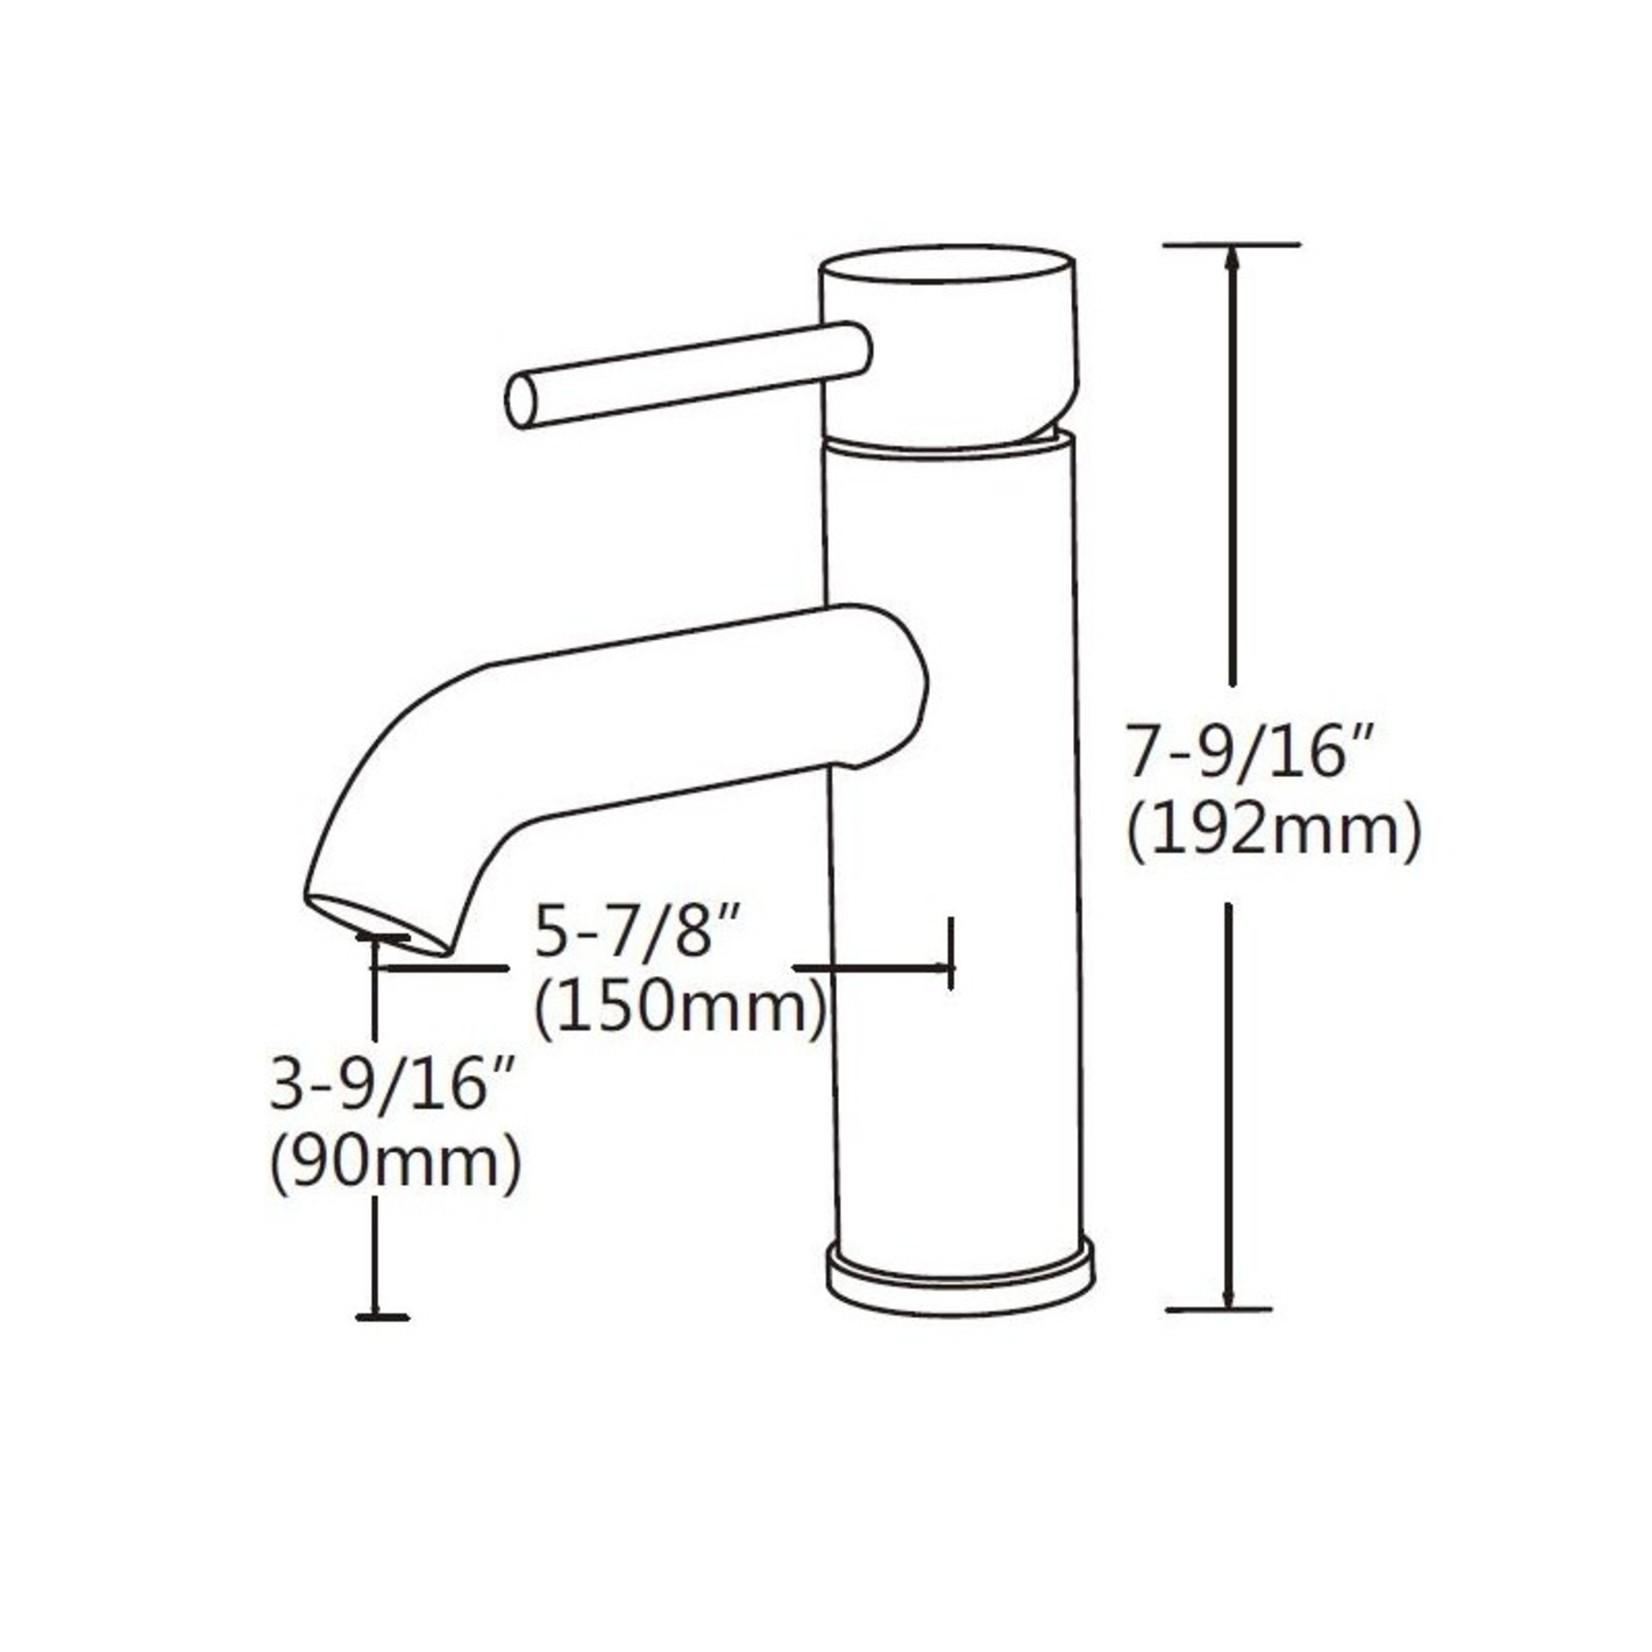 Robinet de lavabo chrome collection Elyn 113-10